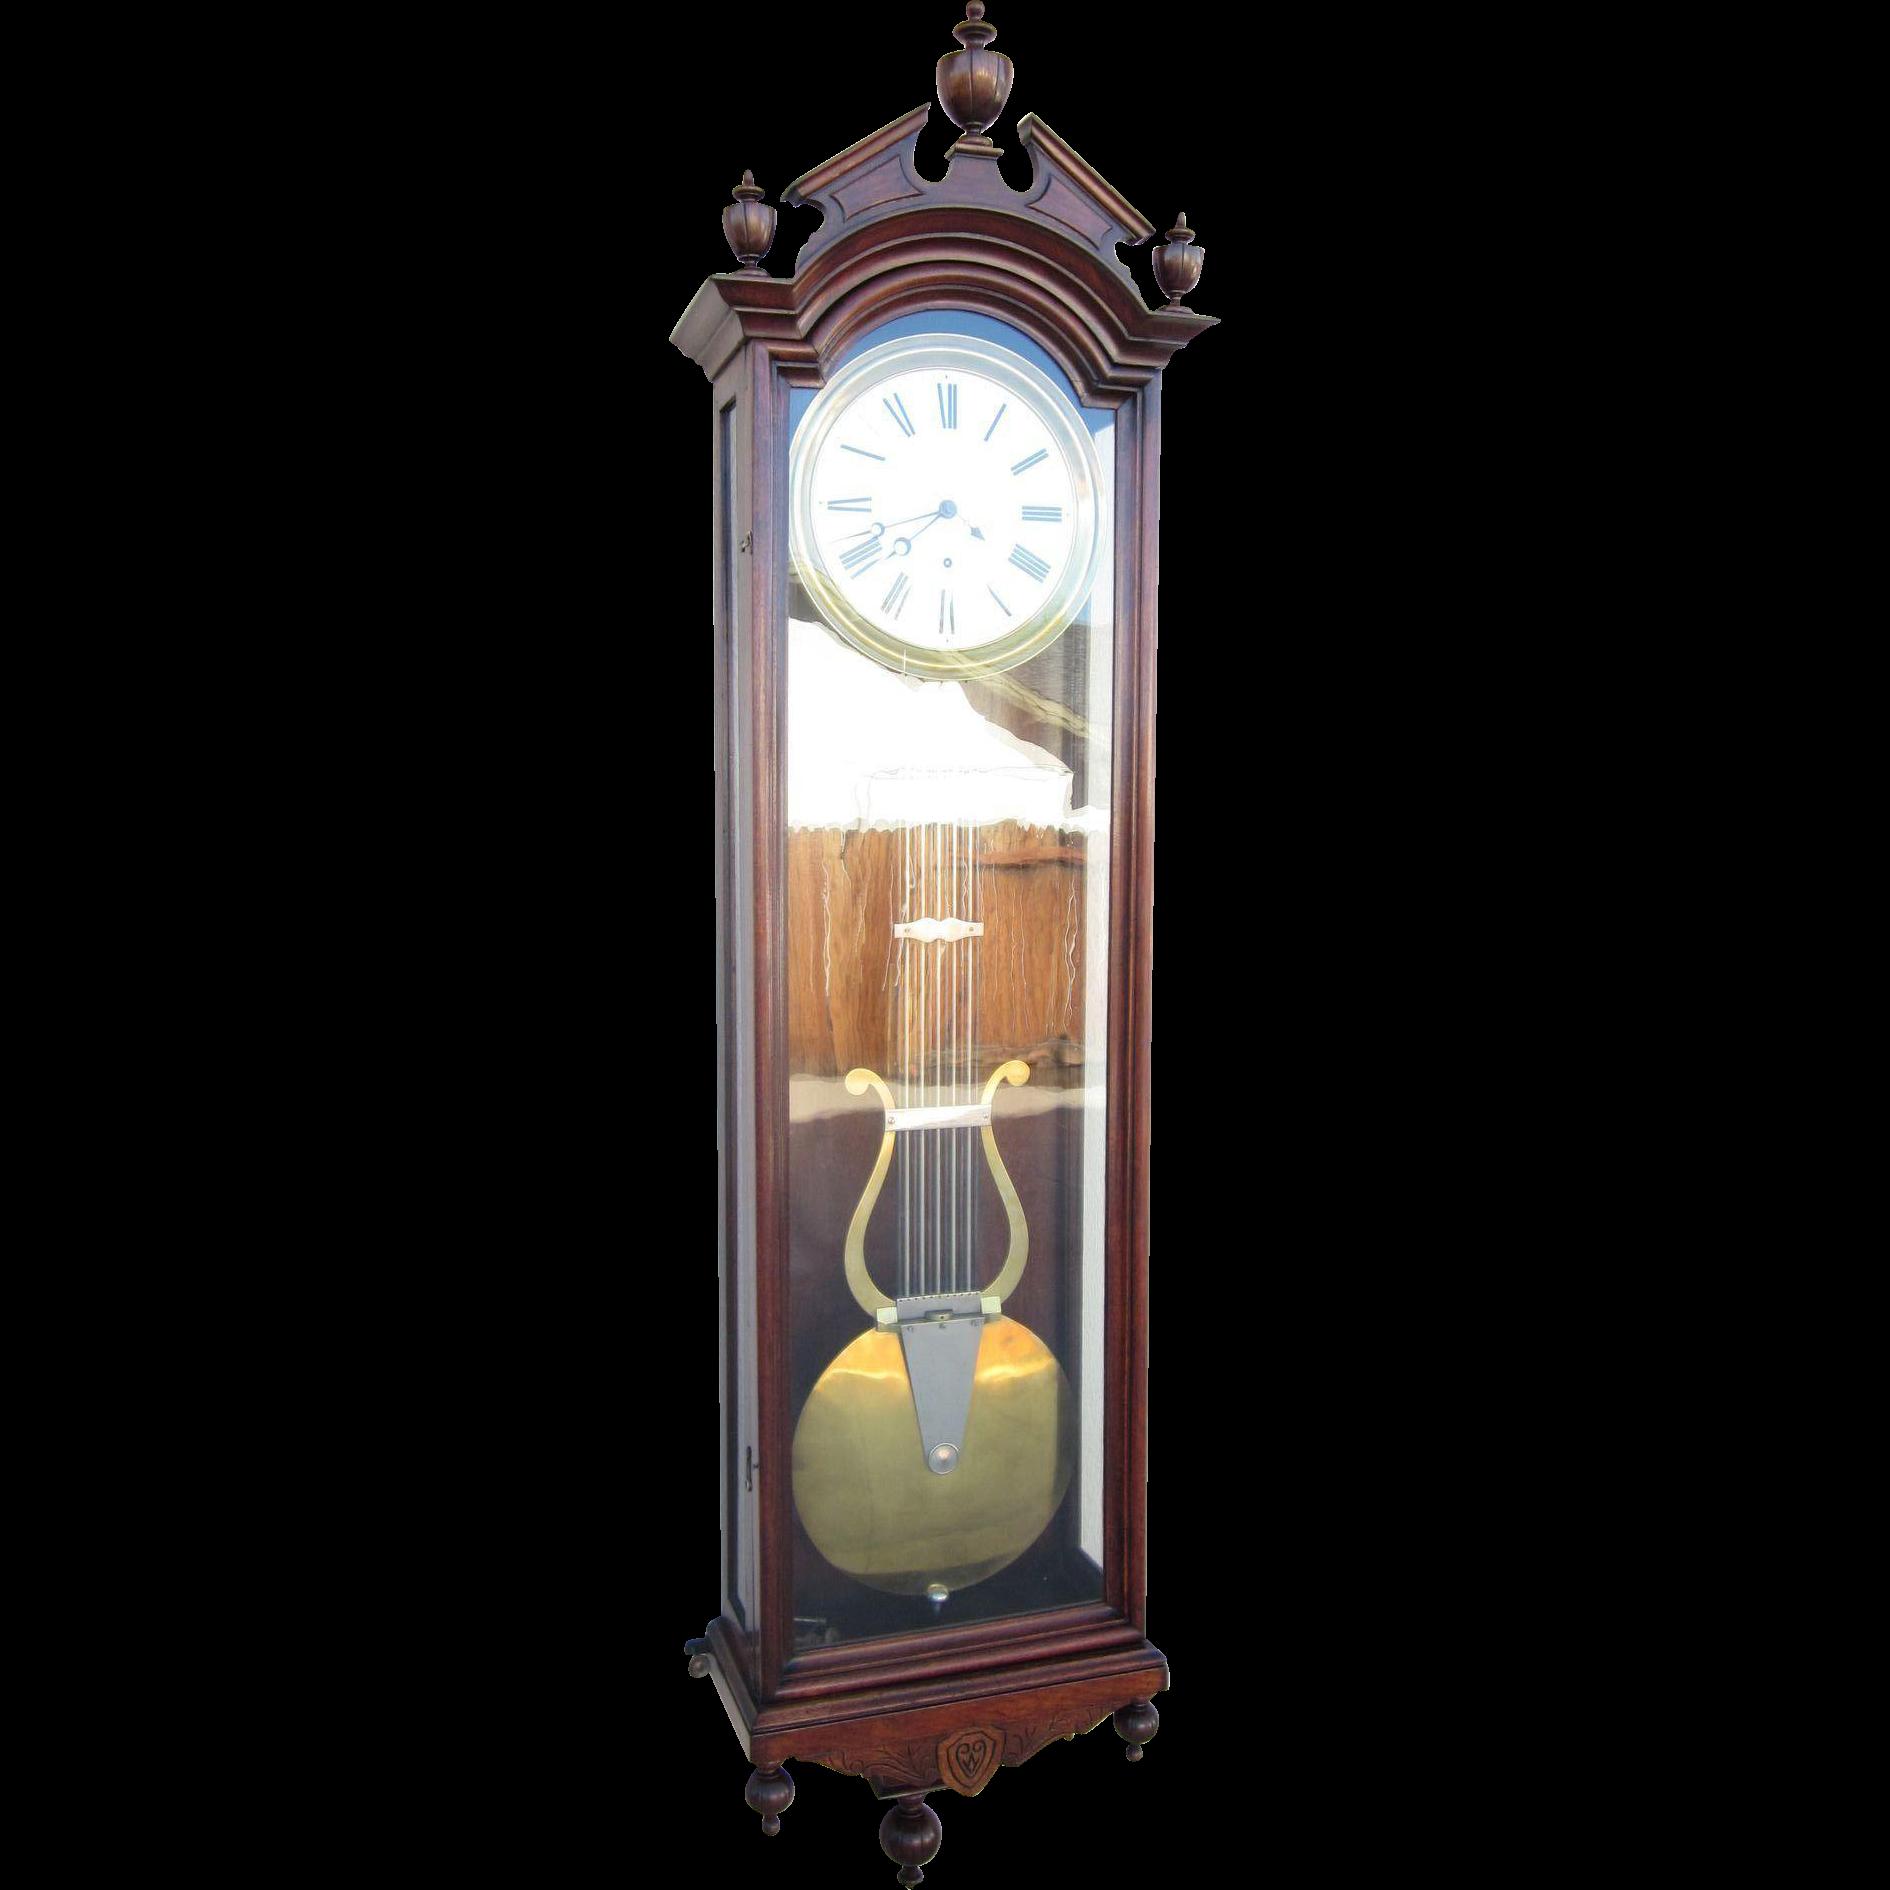 Massive Ansonia Jewelers Regulator Wall Clock No 4 In Walnut